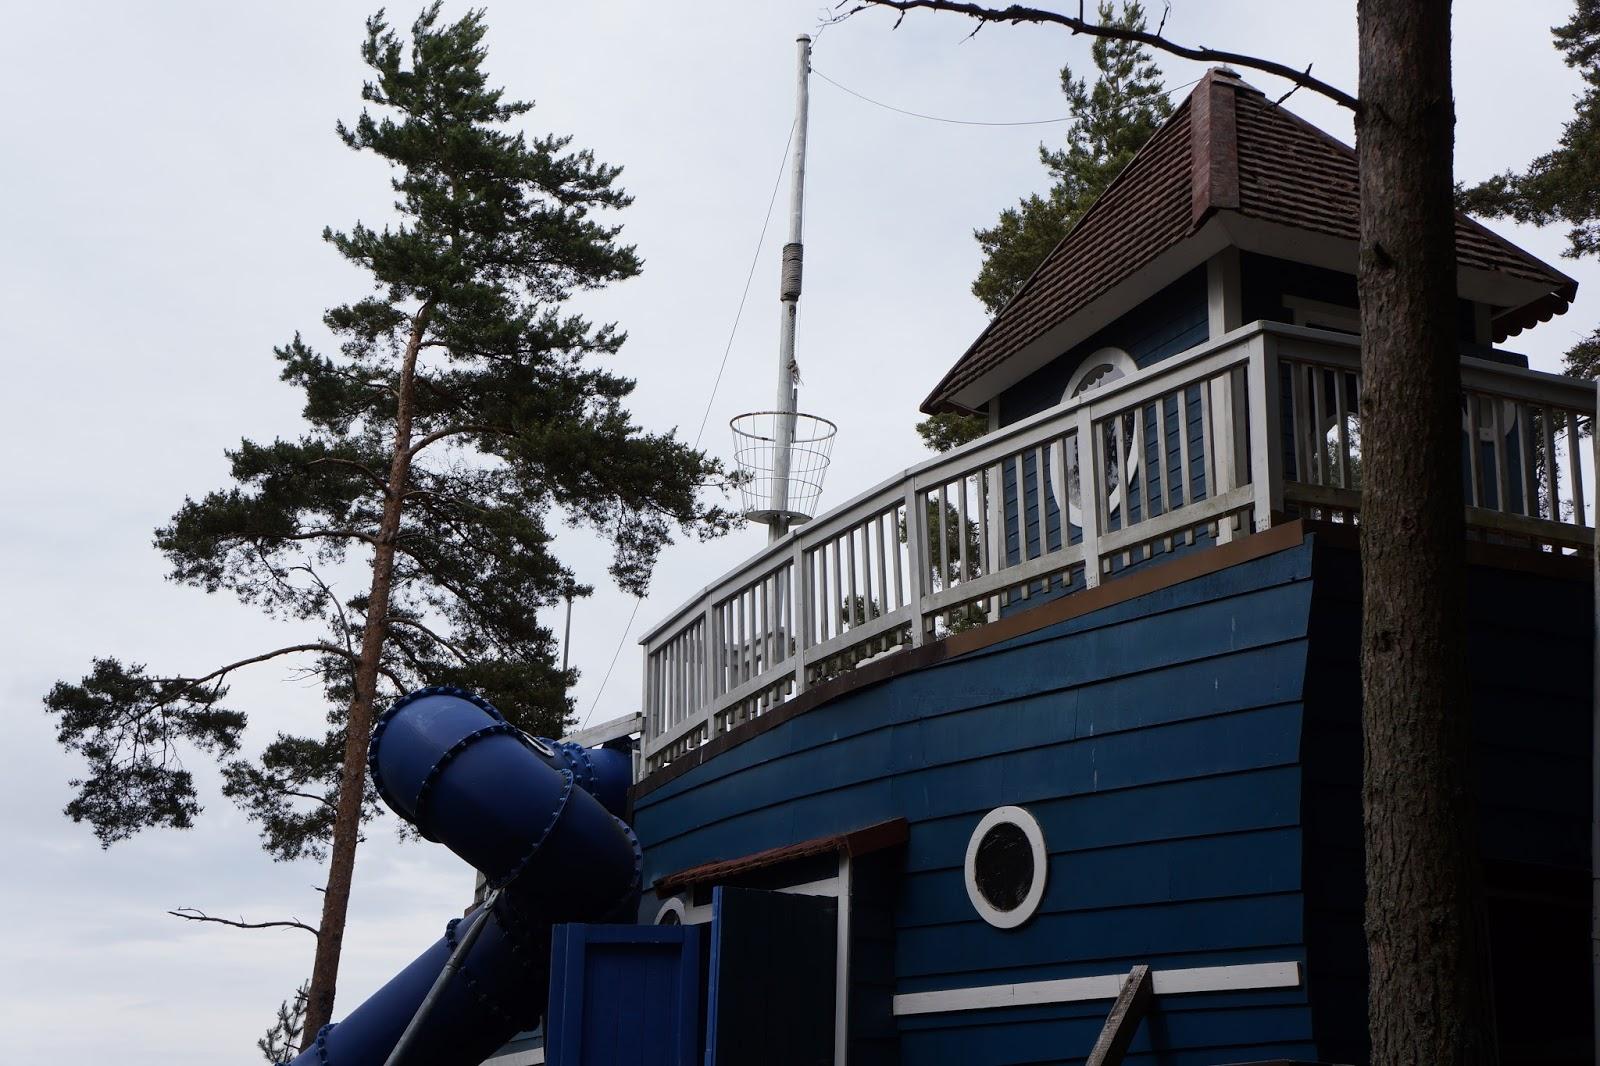 moomin world finland moominpappas boat